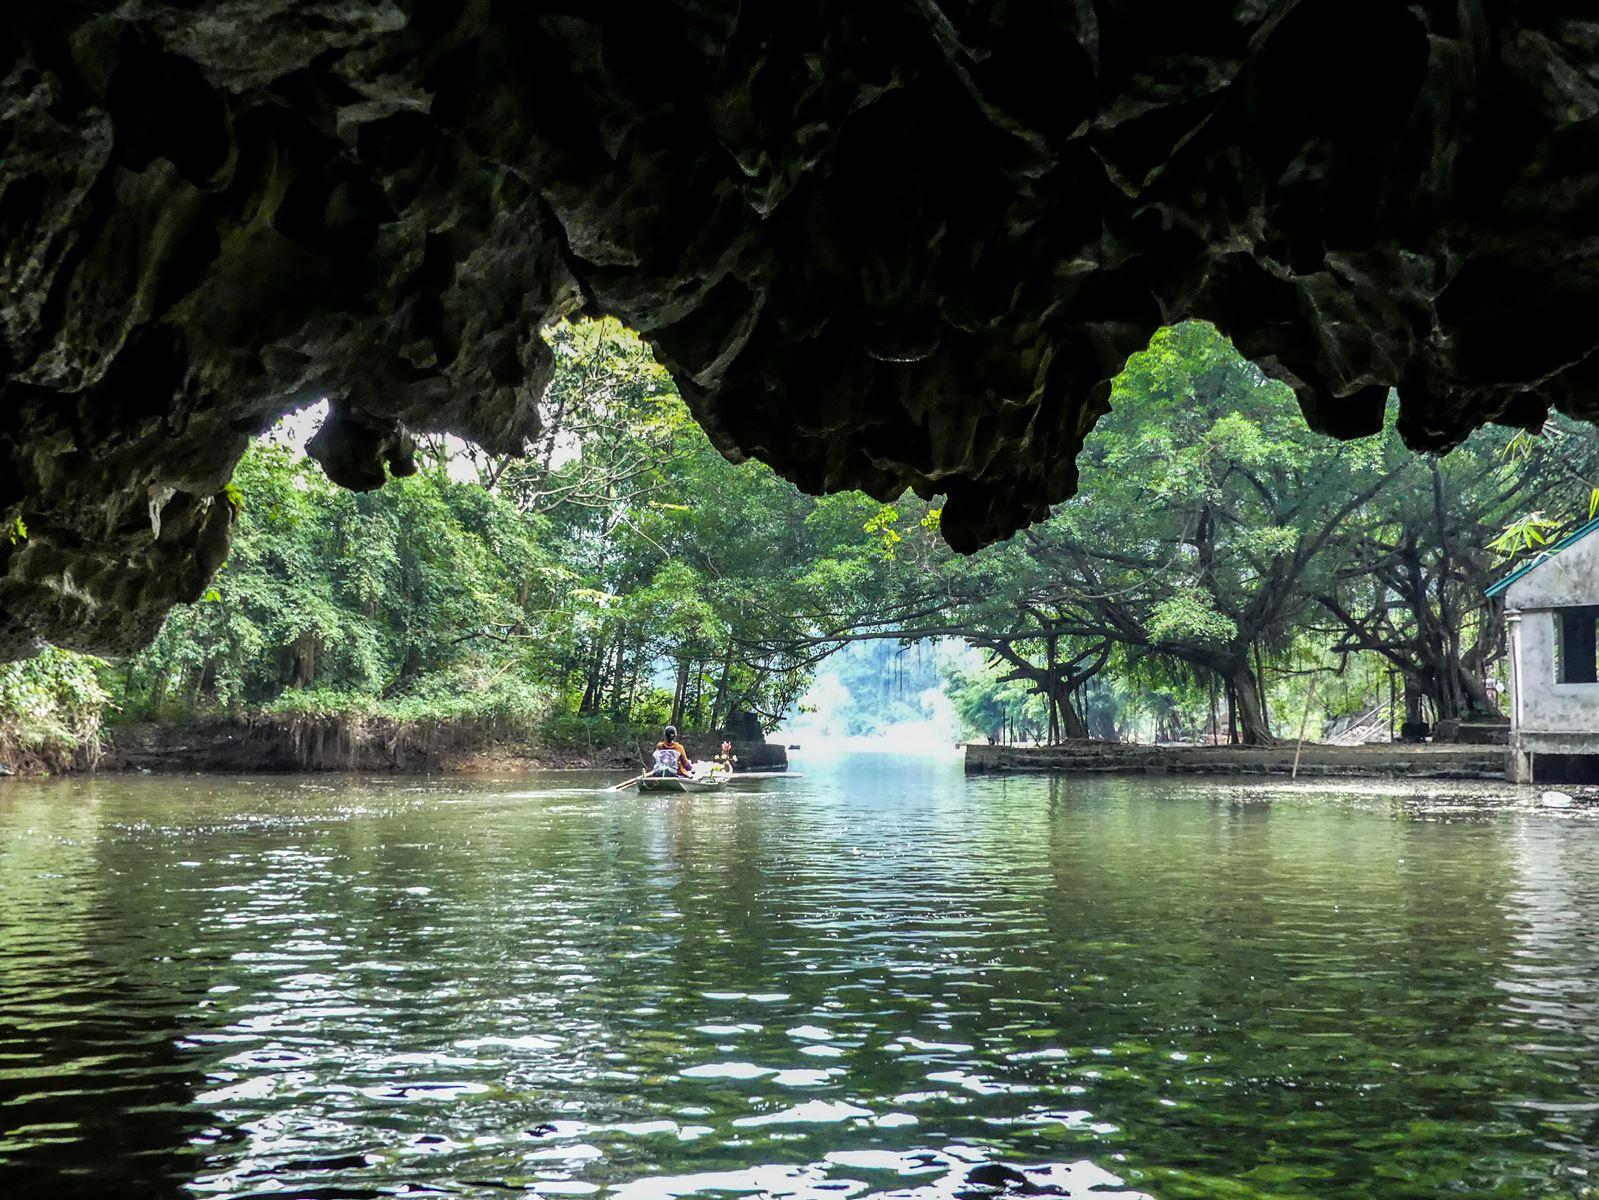 Balade en Barque province de Ninh Binh - Tam Coc - Baie d'Halong terrestre